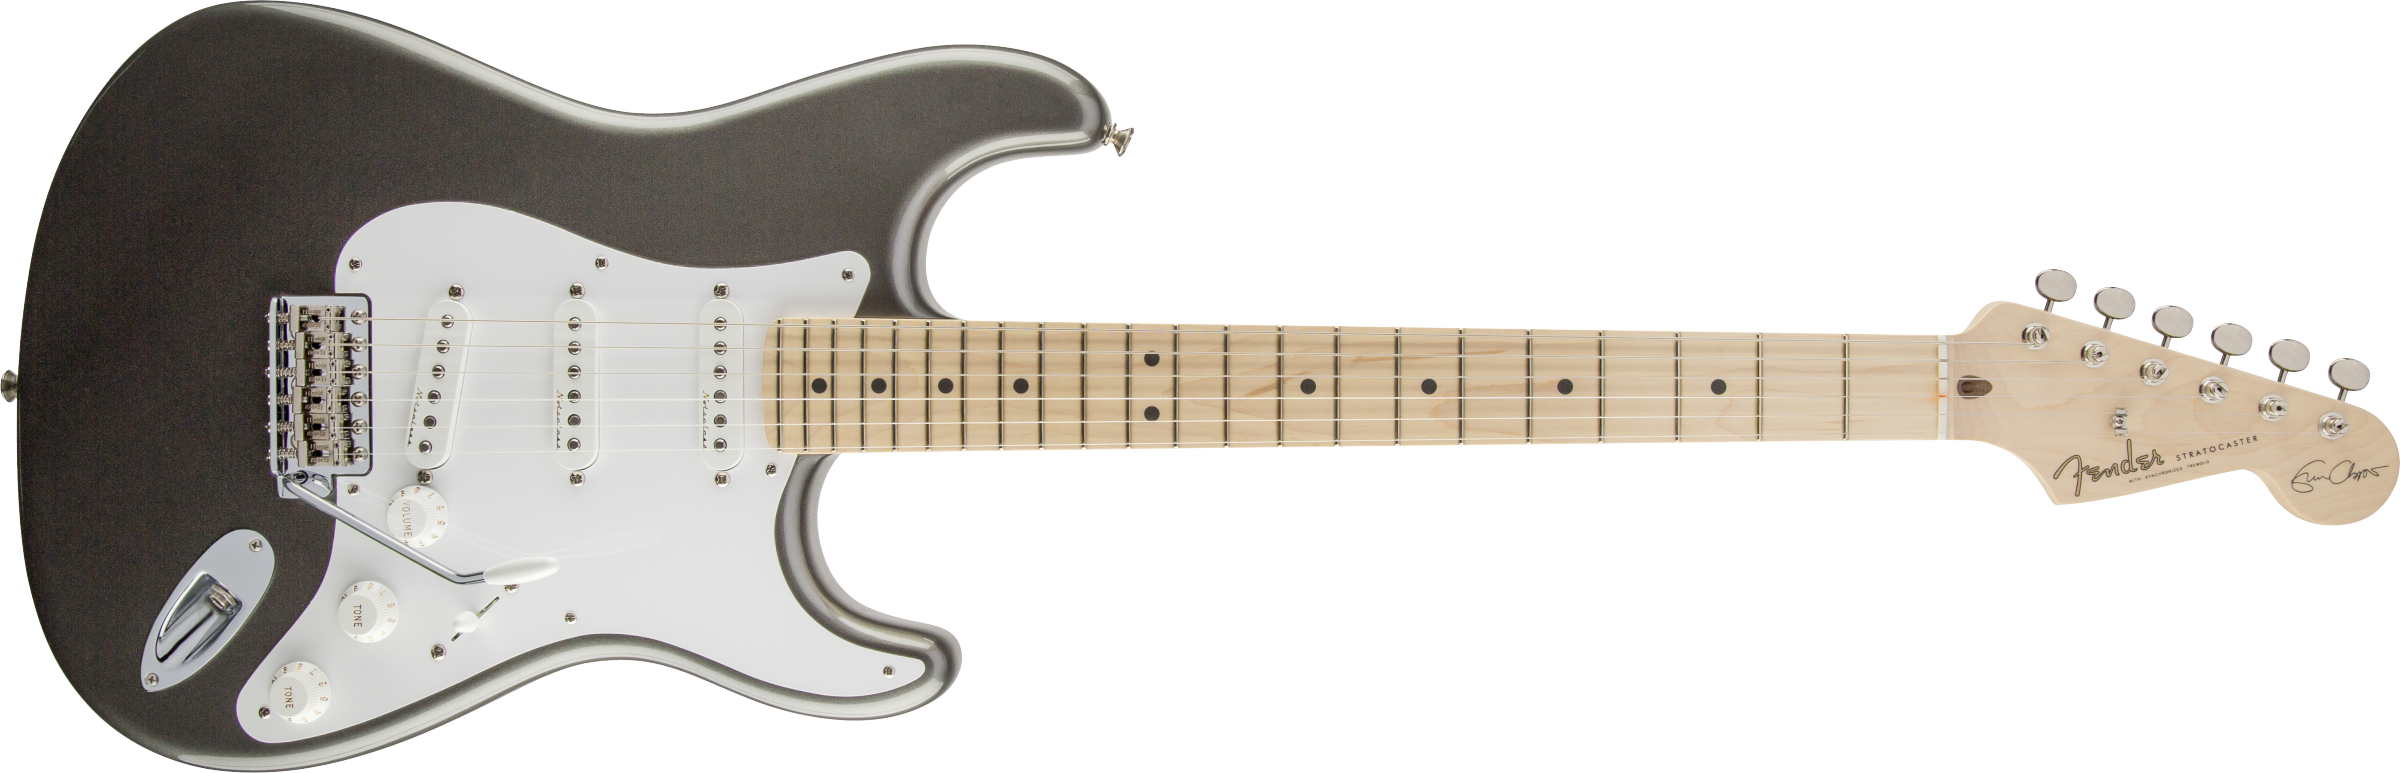 FENDER-Eric-Clapton-Stratocaster-Maple-Fingerboard-Pewter-sku-571001015